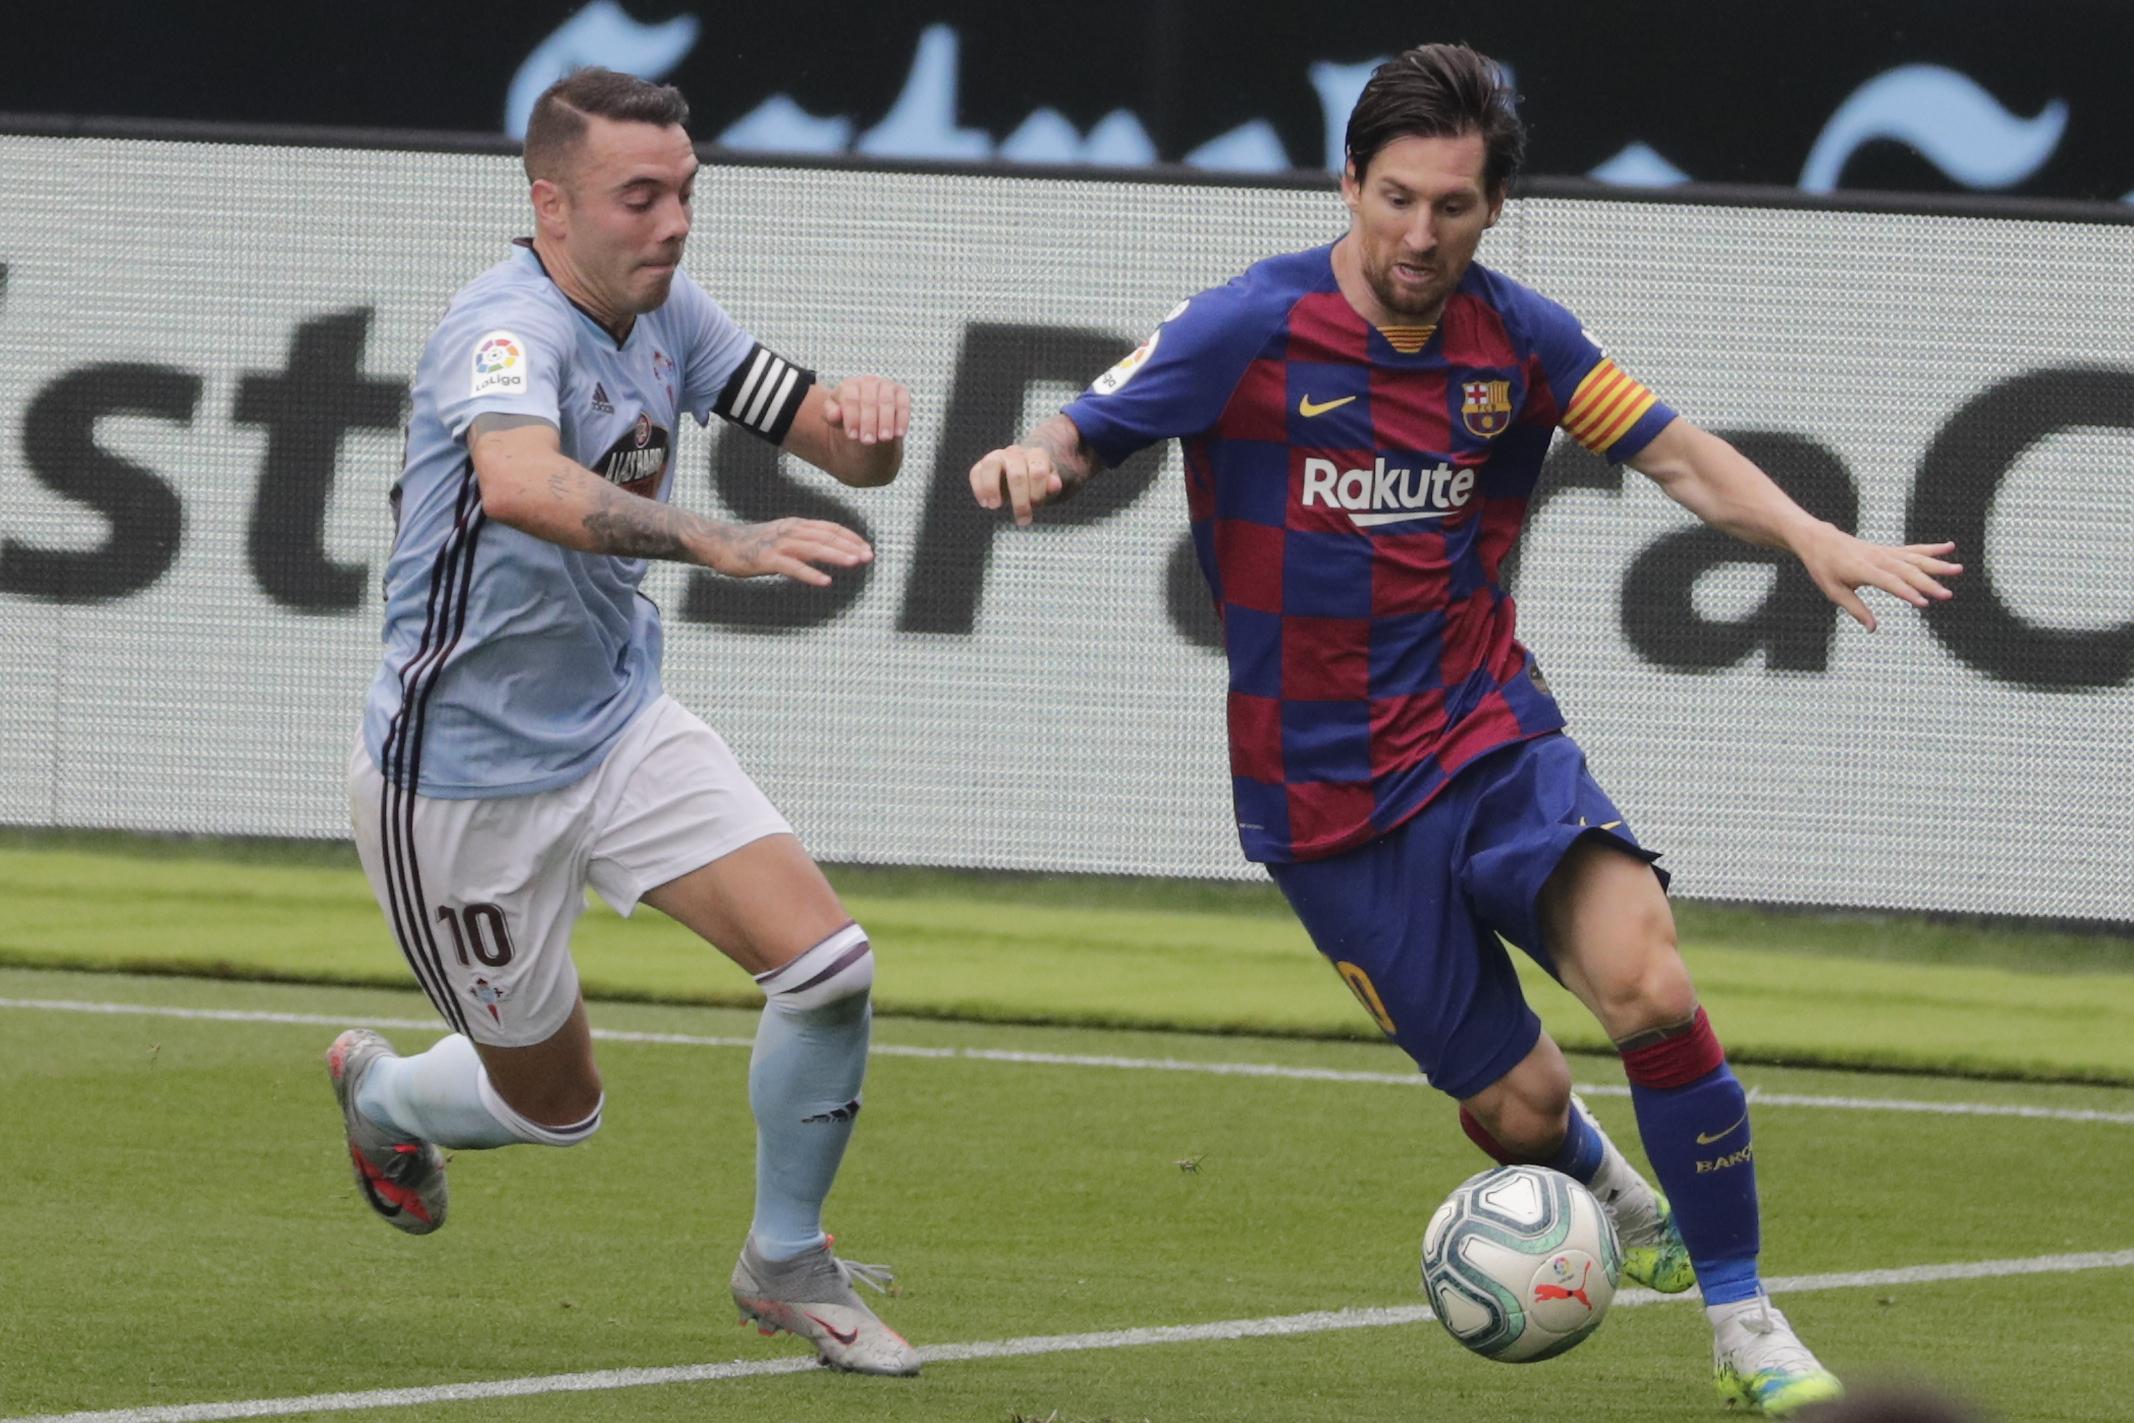 Fc Barcelona Vs Atletico Madrid Free Live Stream 6 30 20 Watch La Liga Online Time Usa Tv Channel Nj Com